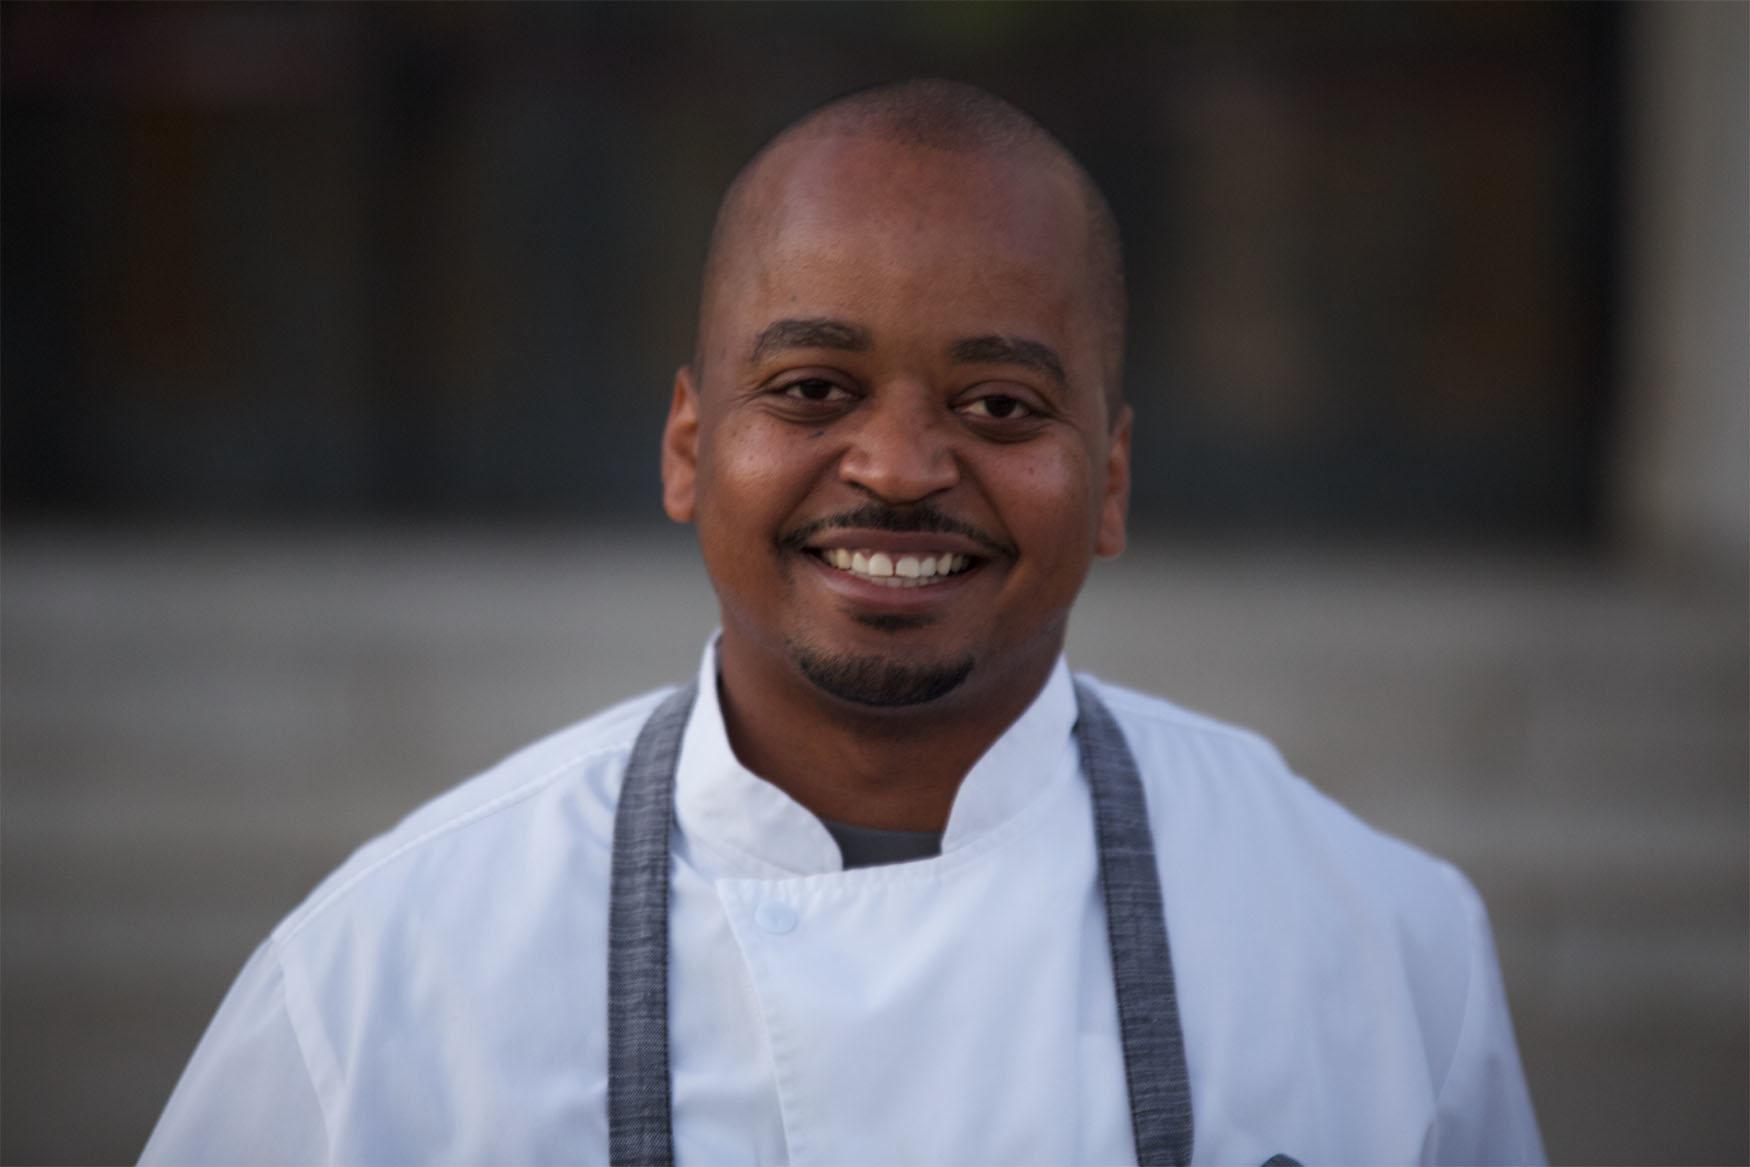 Chef Ryan Rondeno